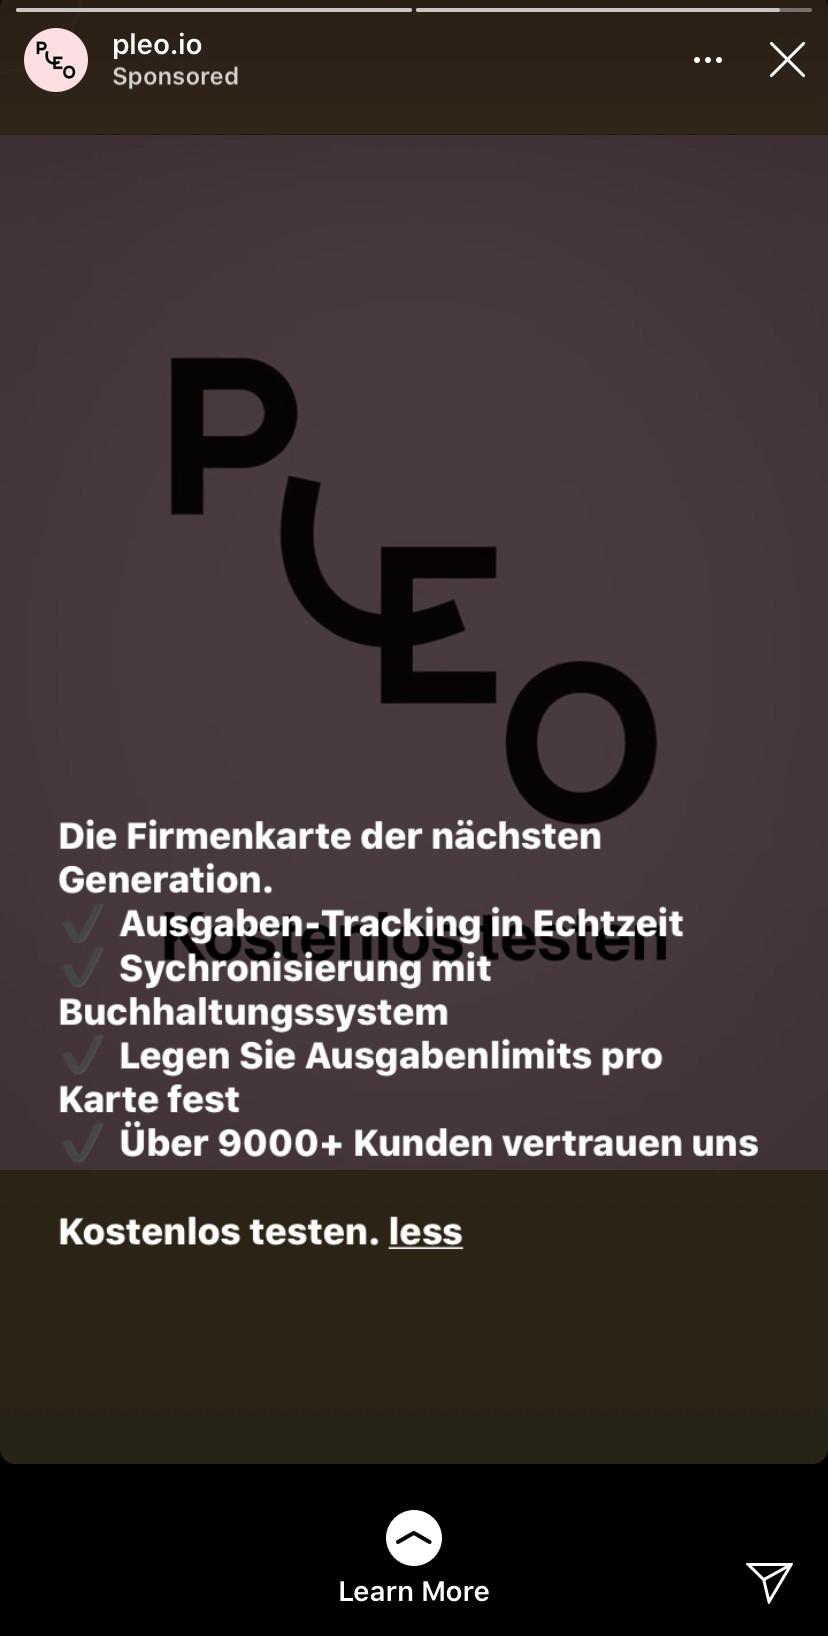 Pleo Ad